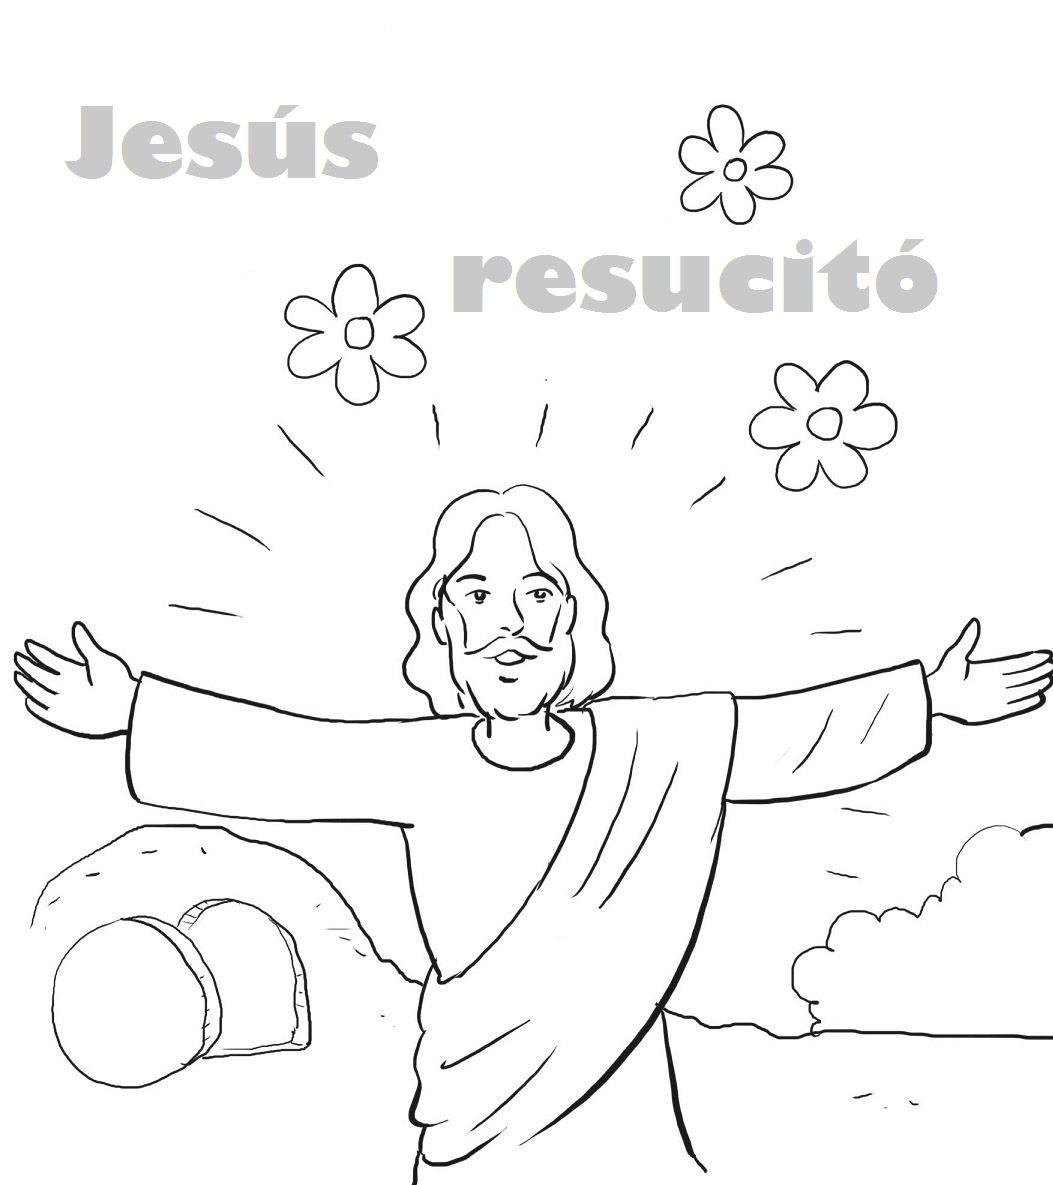 dibujos sobre Jesús para colorear | Dibujos De Jesús | Pinterest ...